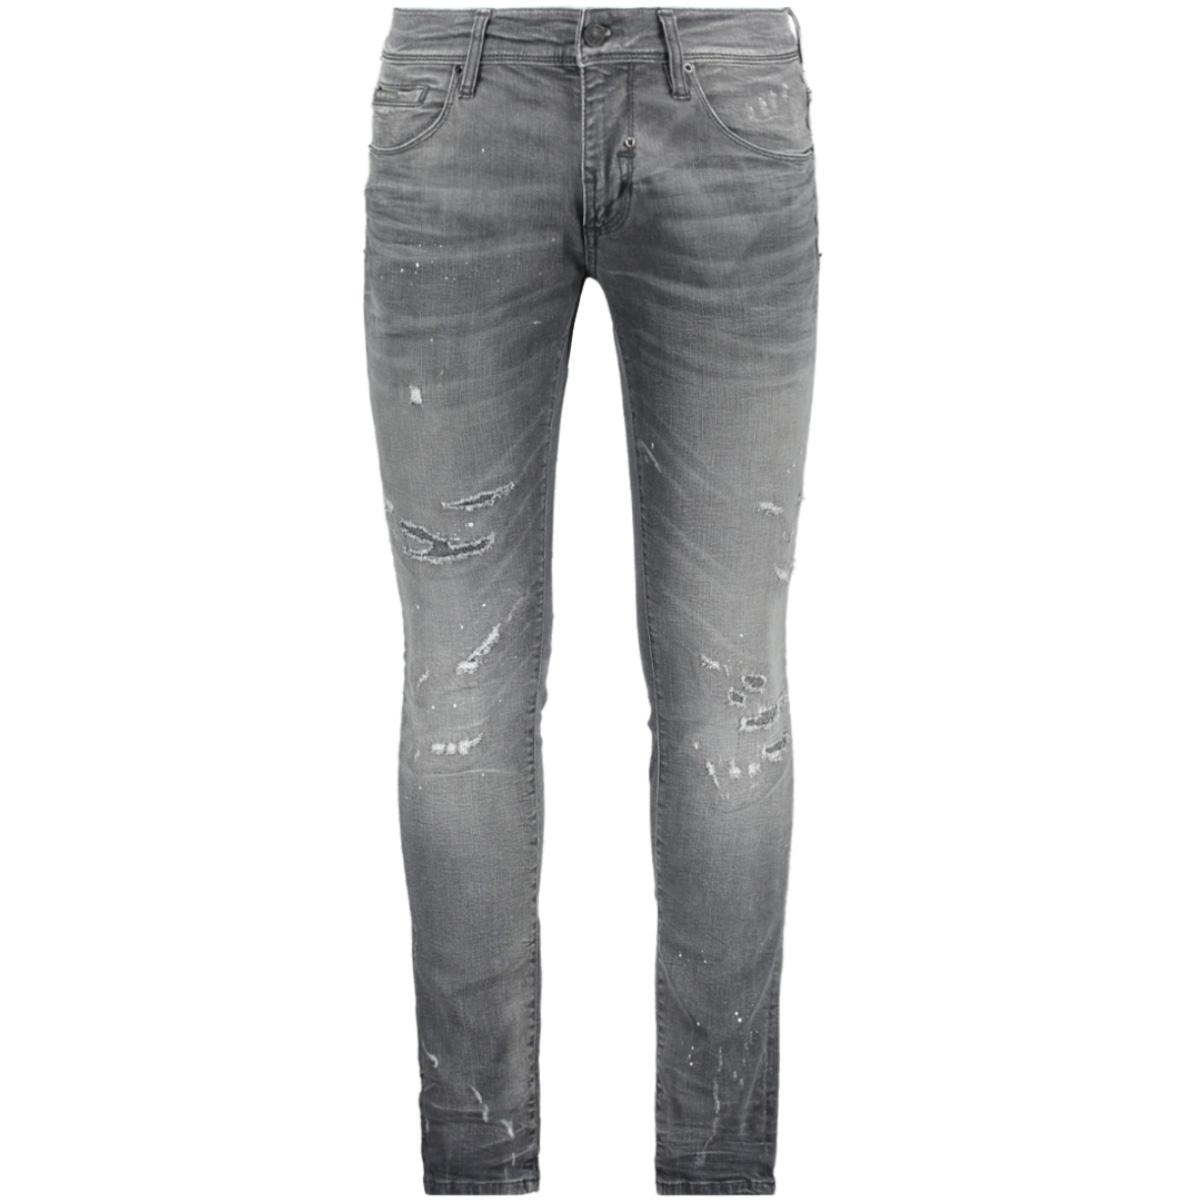 jeans super skinny mmdt00235 antony morato jeans 9001 grey steel